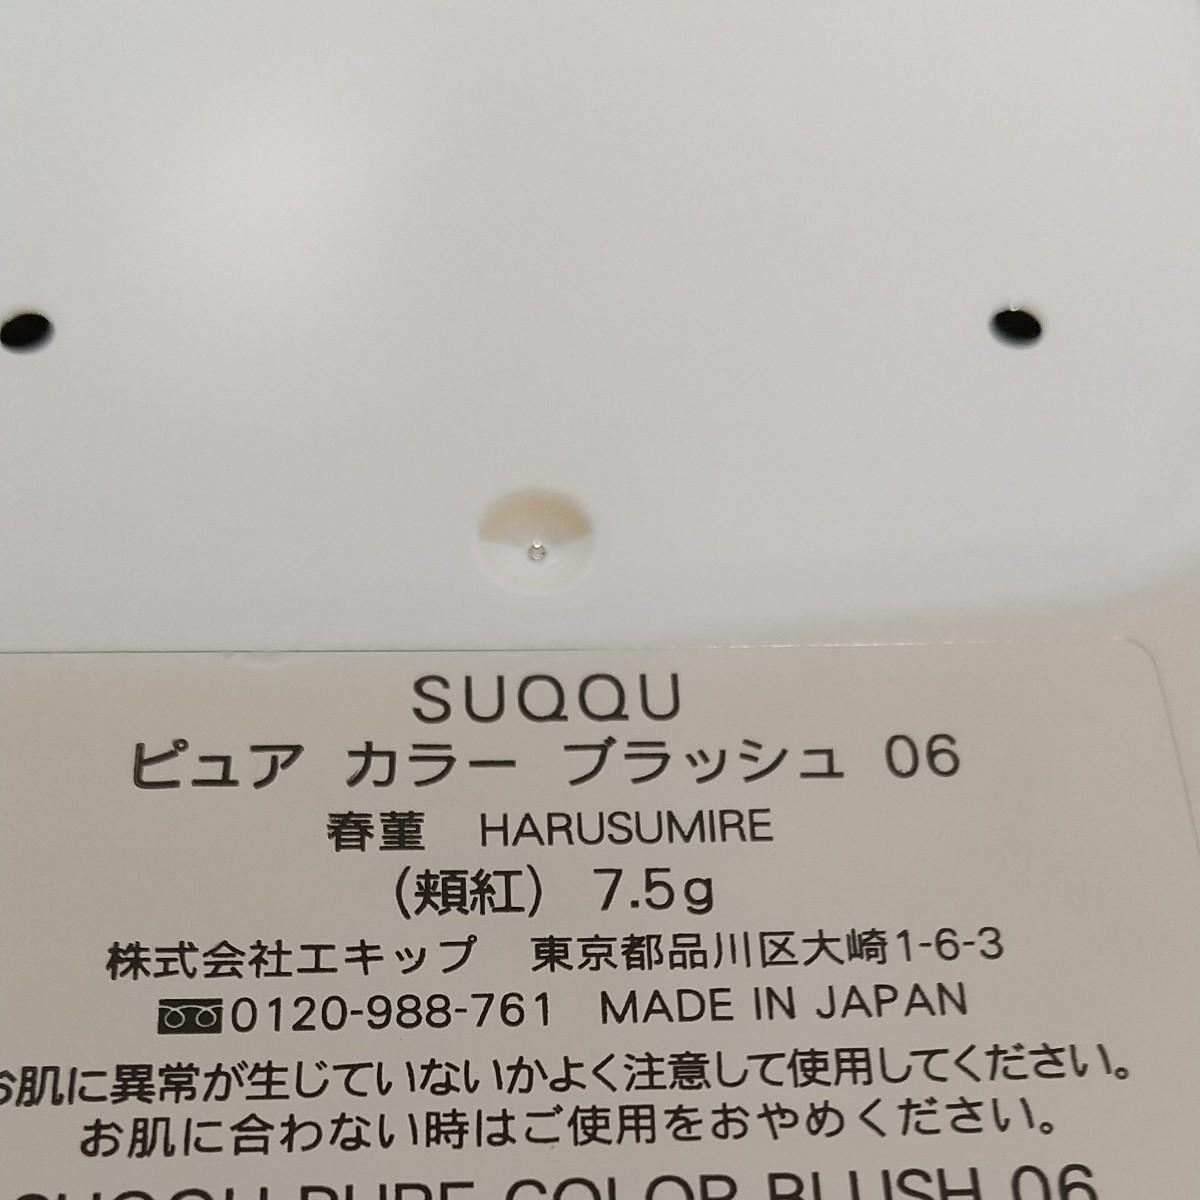 SUQQU ピュアカラーブラッシュ06 春菫